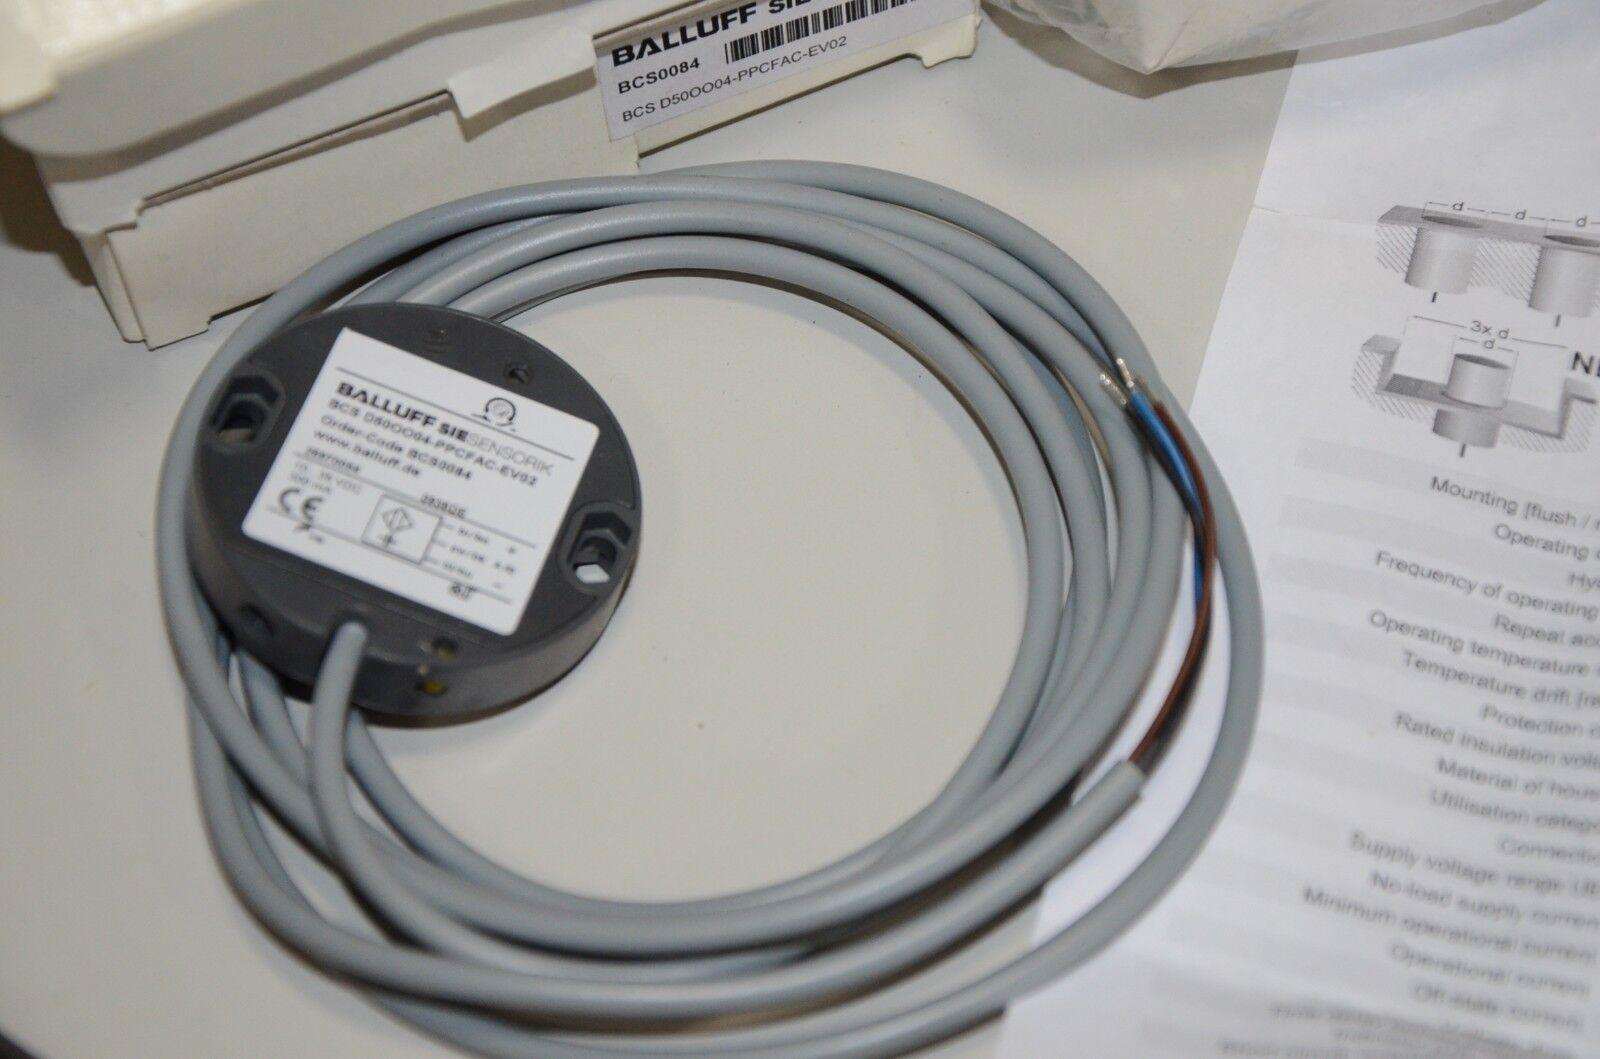 Balluff Siesensorik Bcs0084 Bcs 0084 D50oo04 Smart Level Sensor Ebay Wiring Diagram